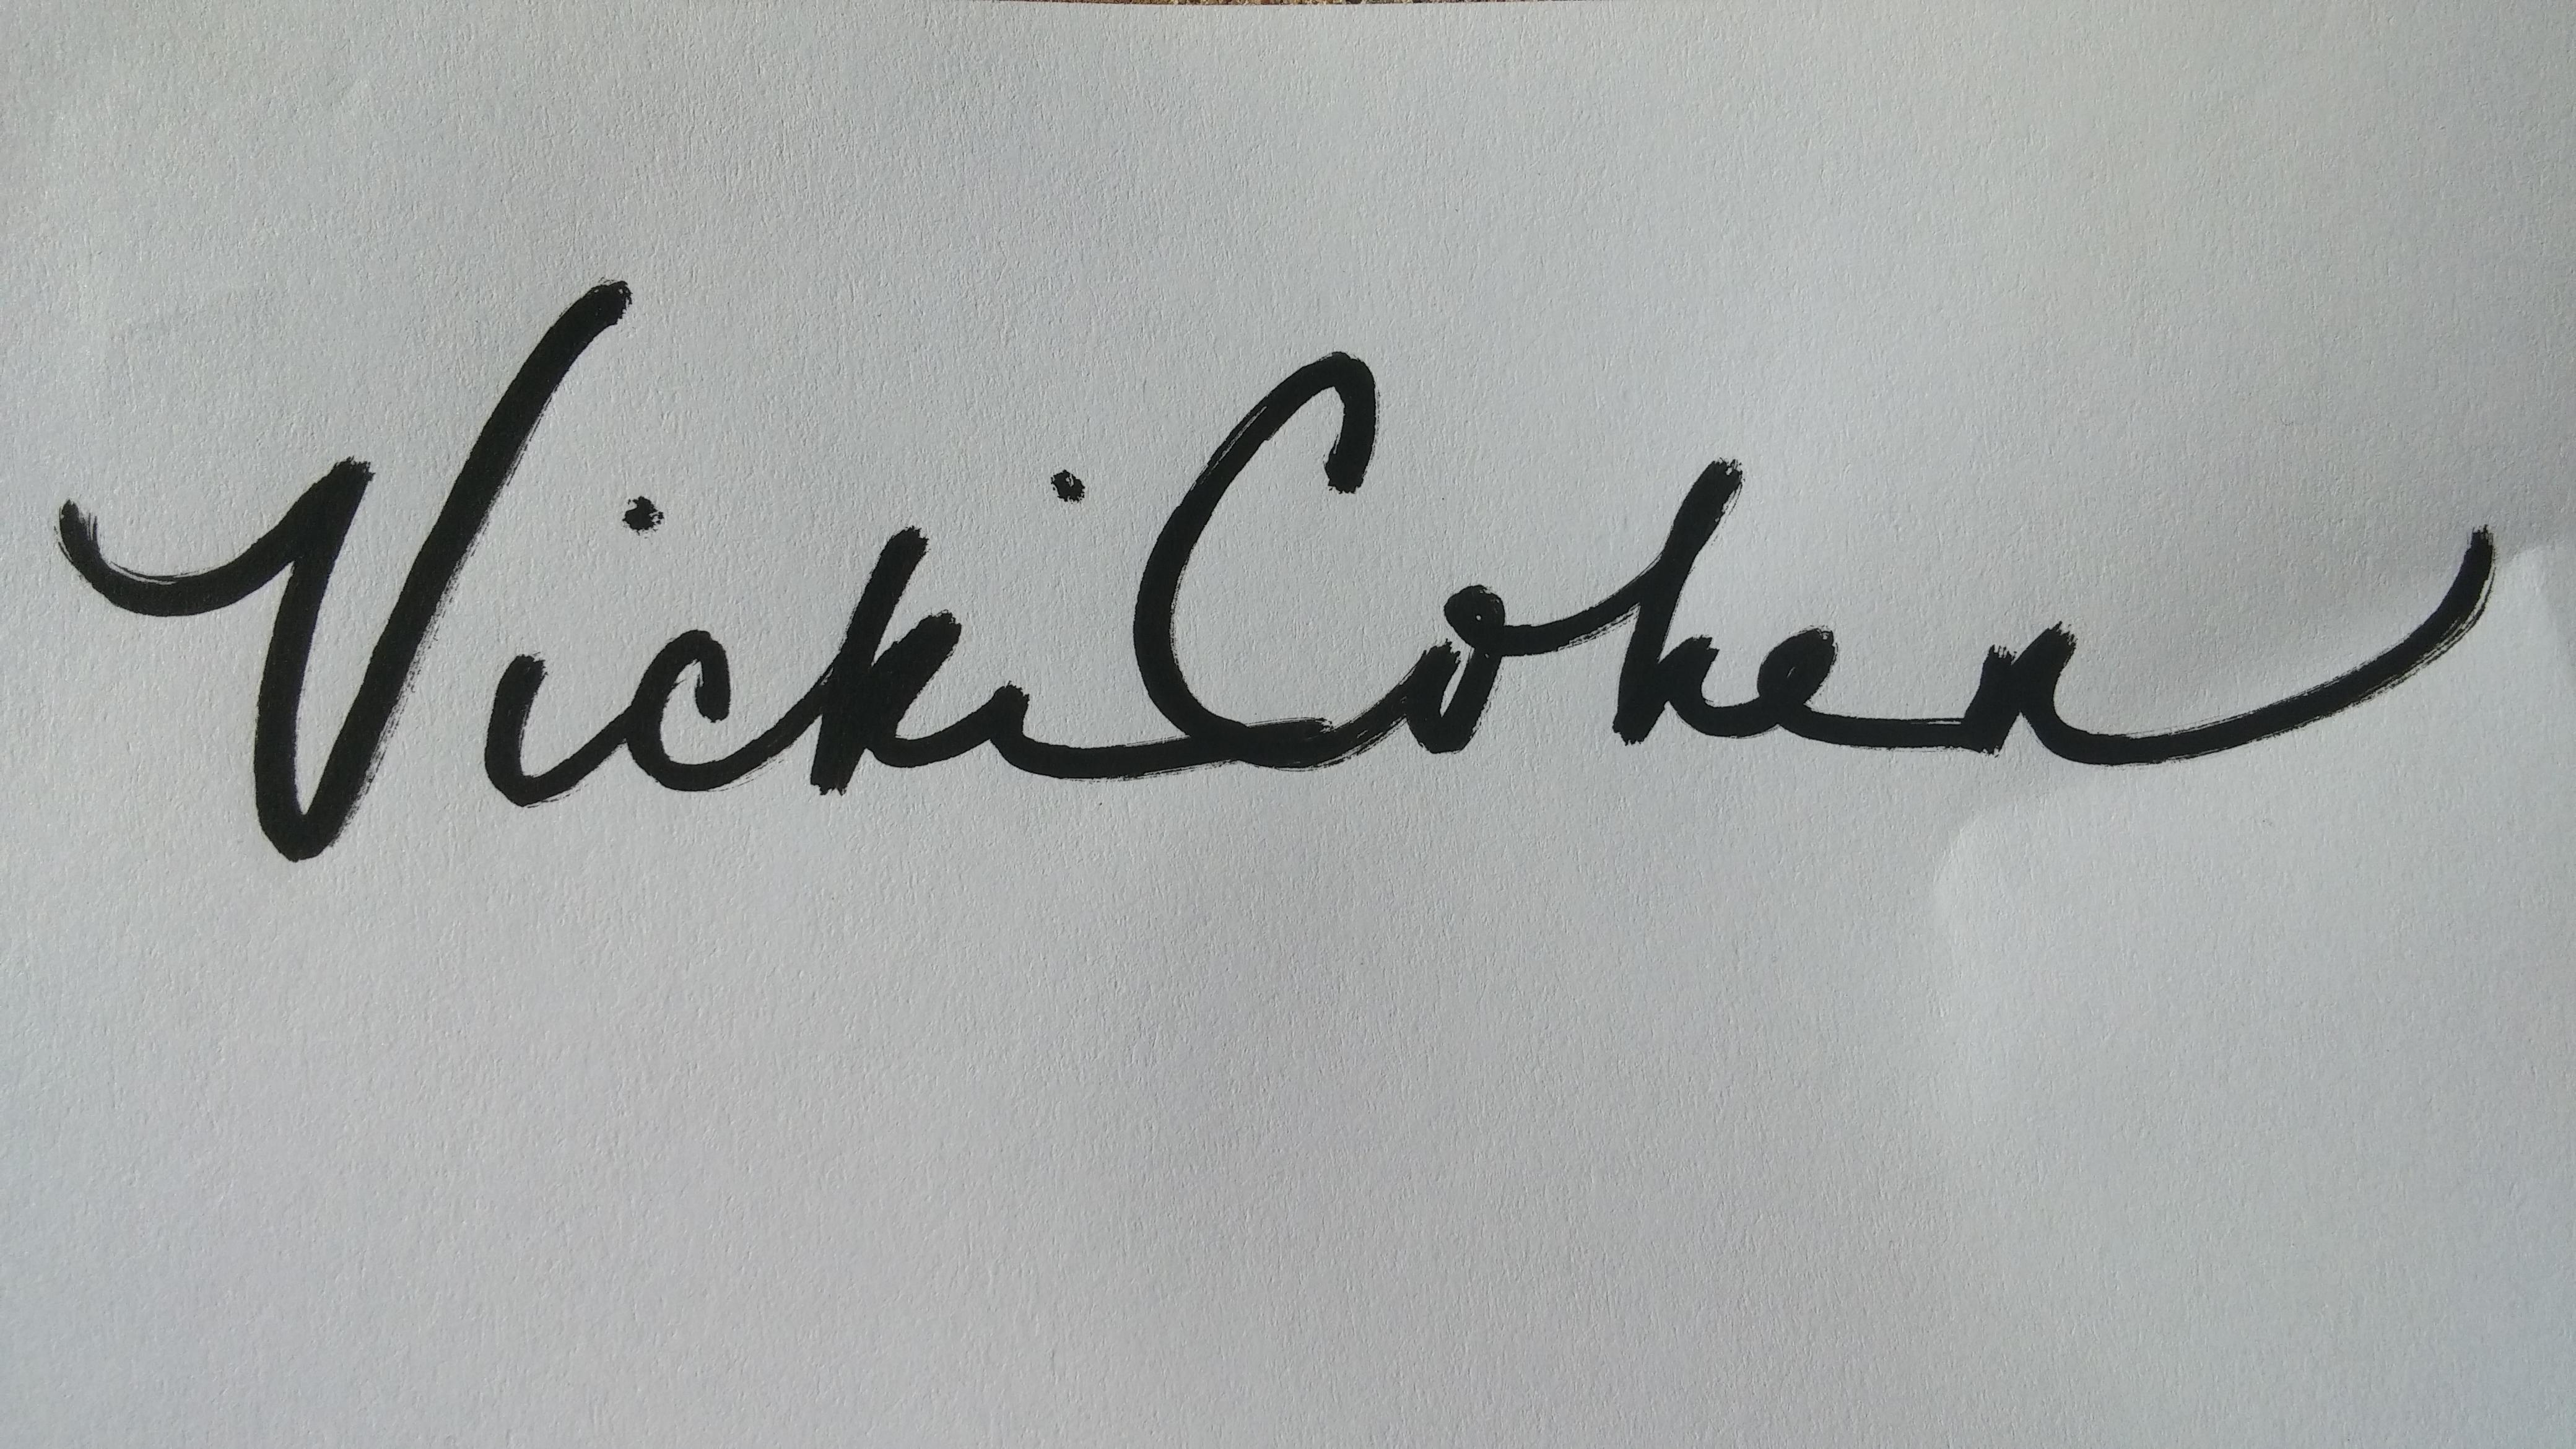 Vicki Cohen Signature